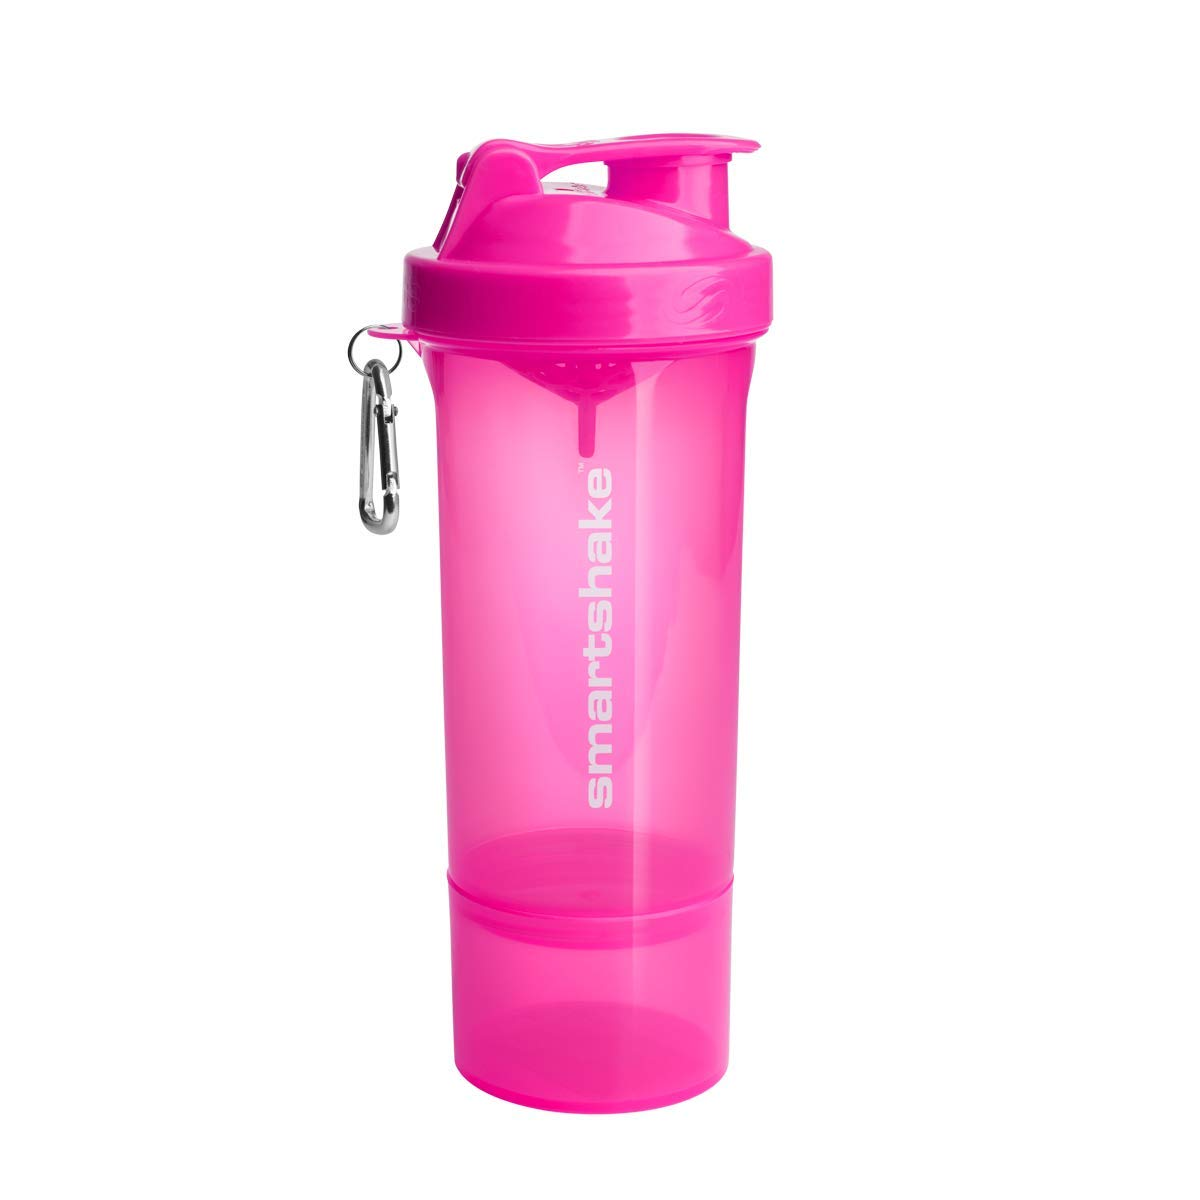 Smartshake SLIM 17-Ounce SHAKER CUP Neon 17-Ounce SHAKER Neon Pink B00JVWA6QG, ウエディングティアラゴージャス屋:f5b0b721 --- dakuwebsite.xyz